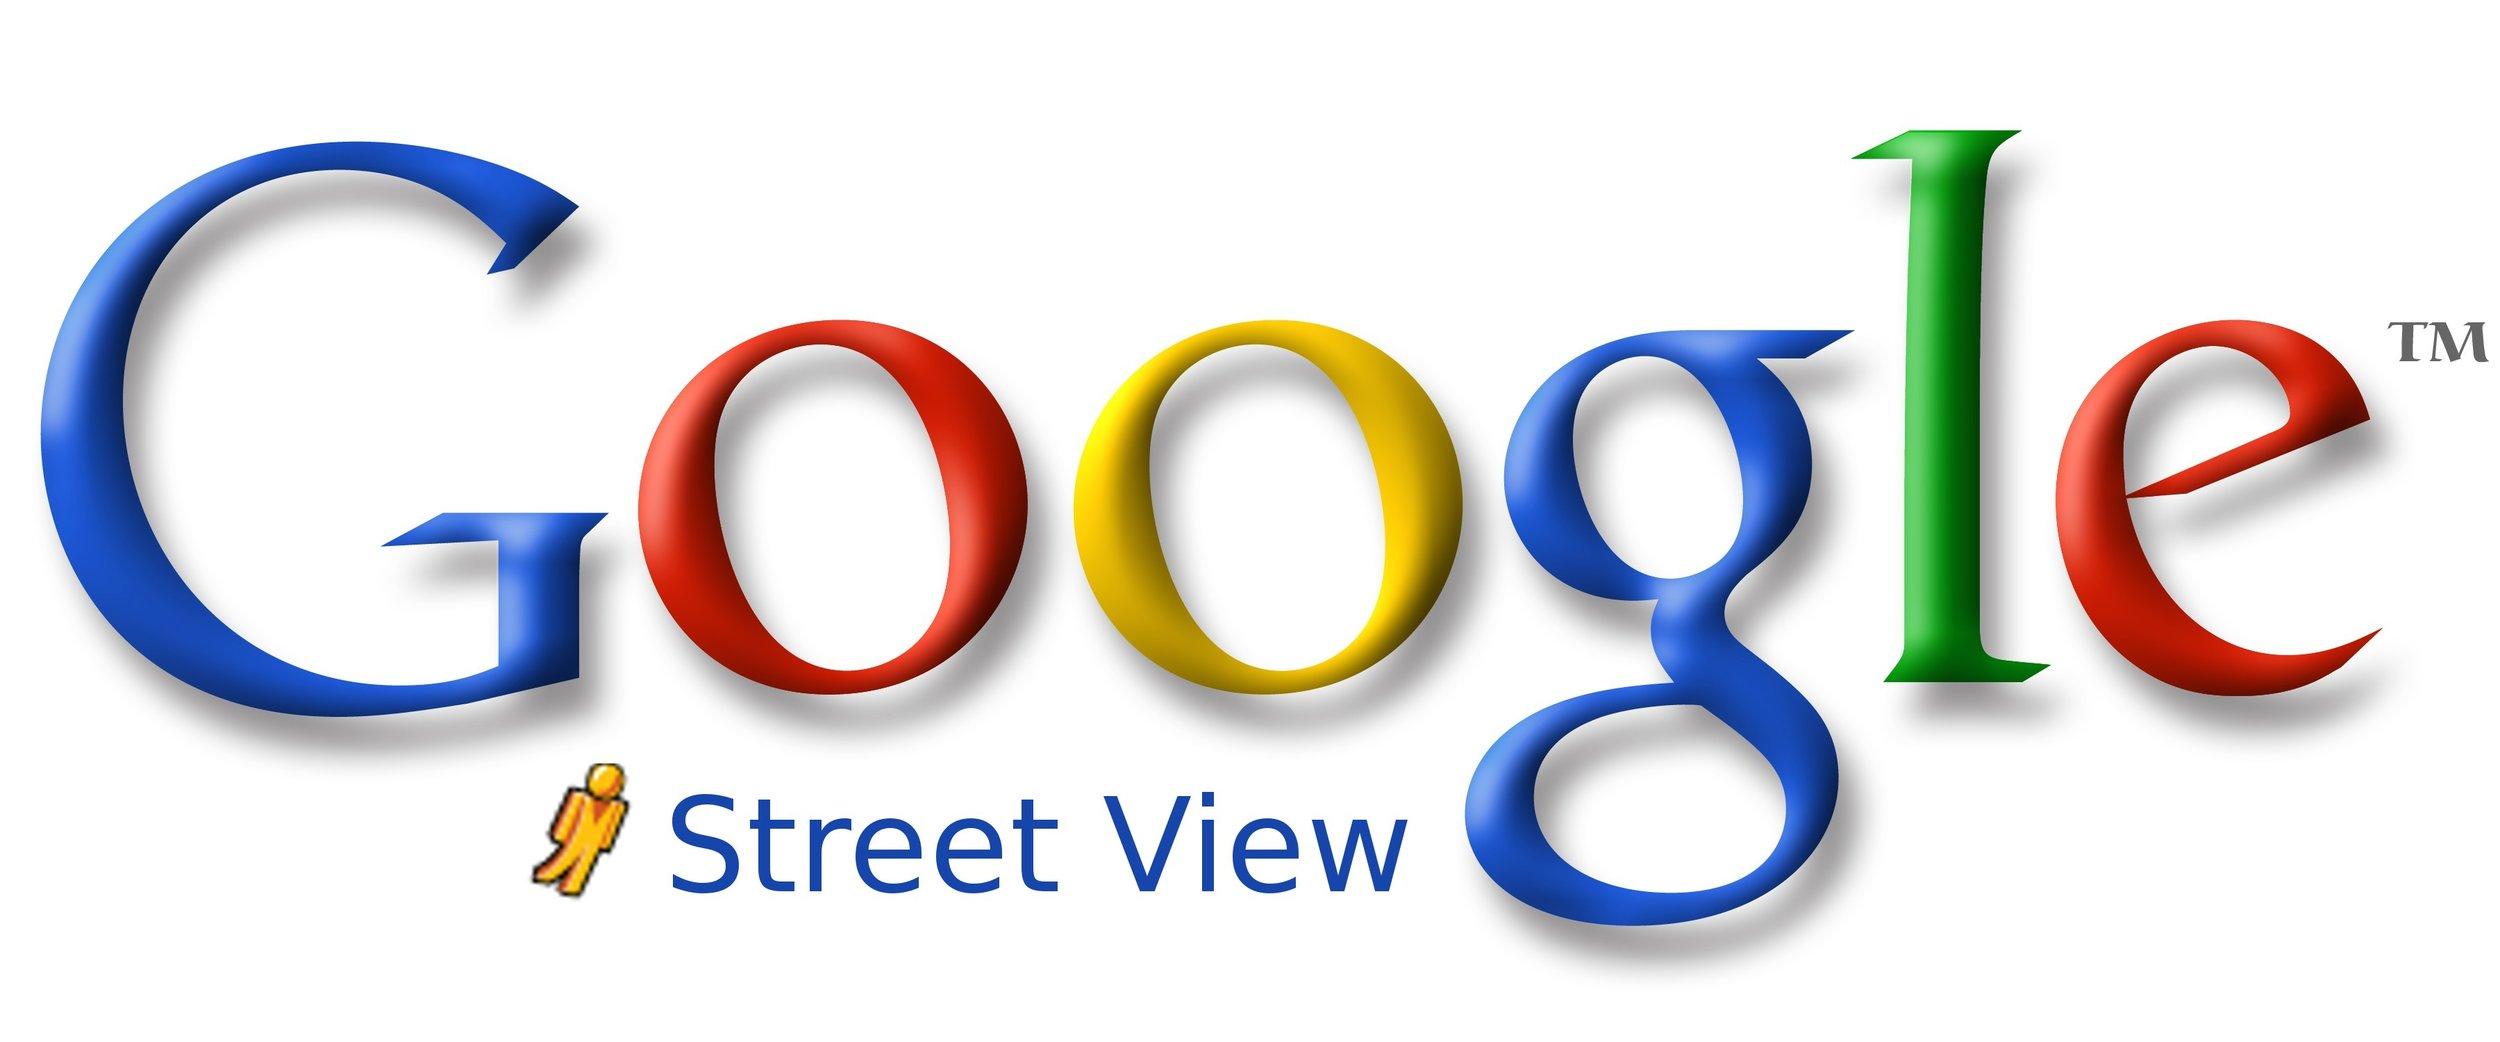 google-street-view-logo.jpeg